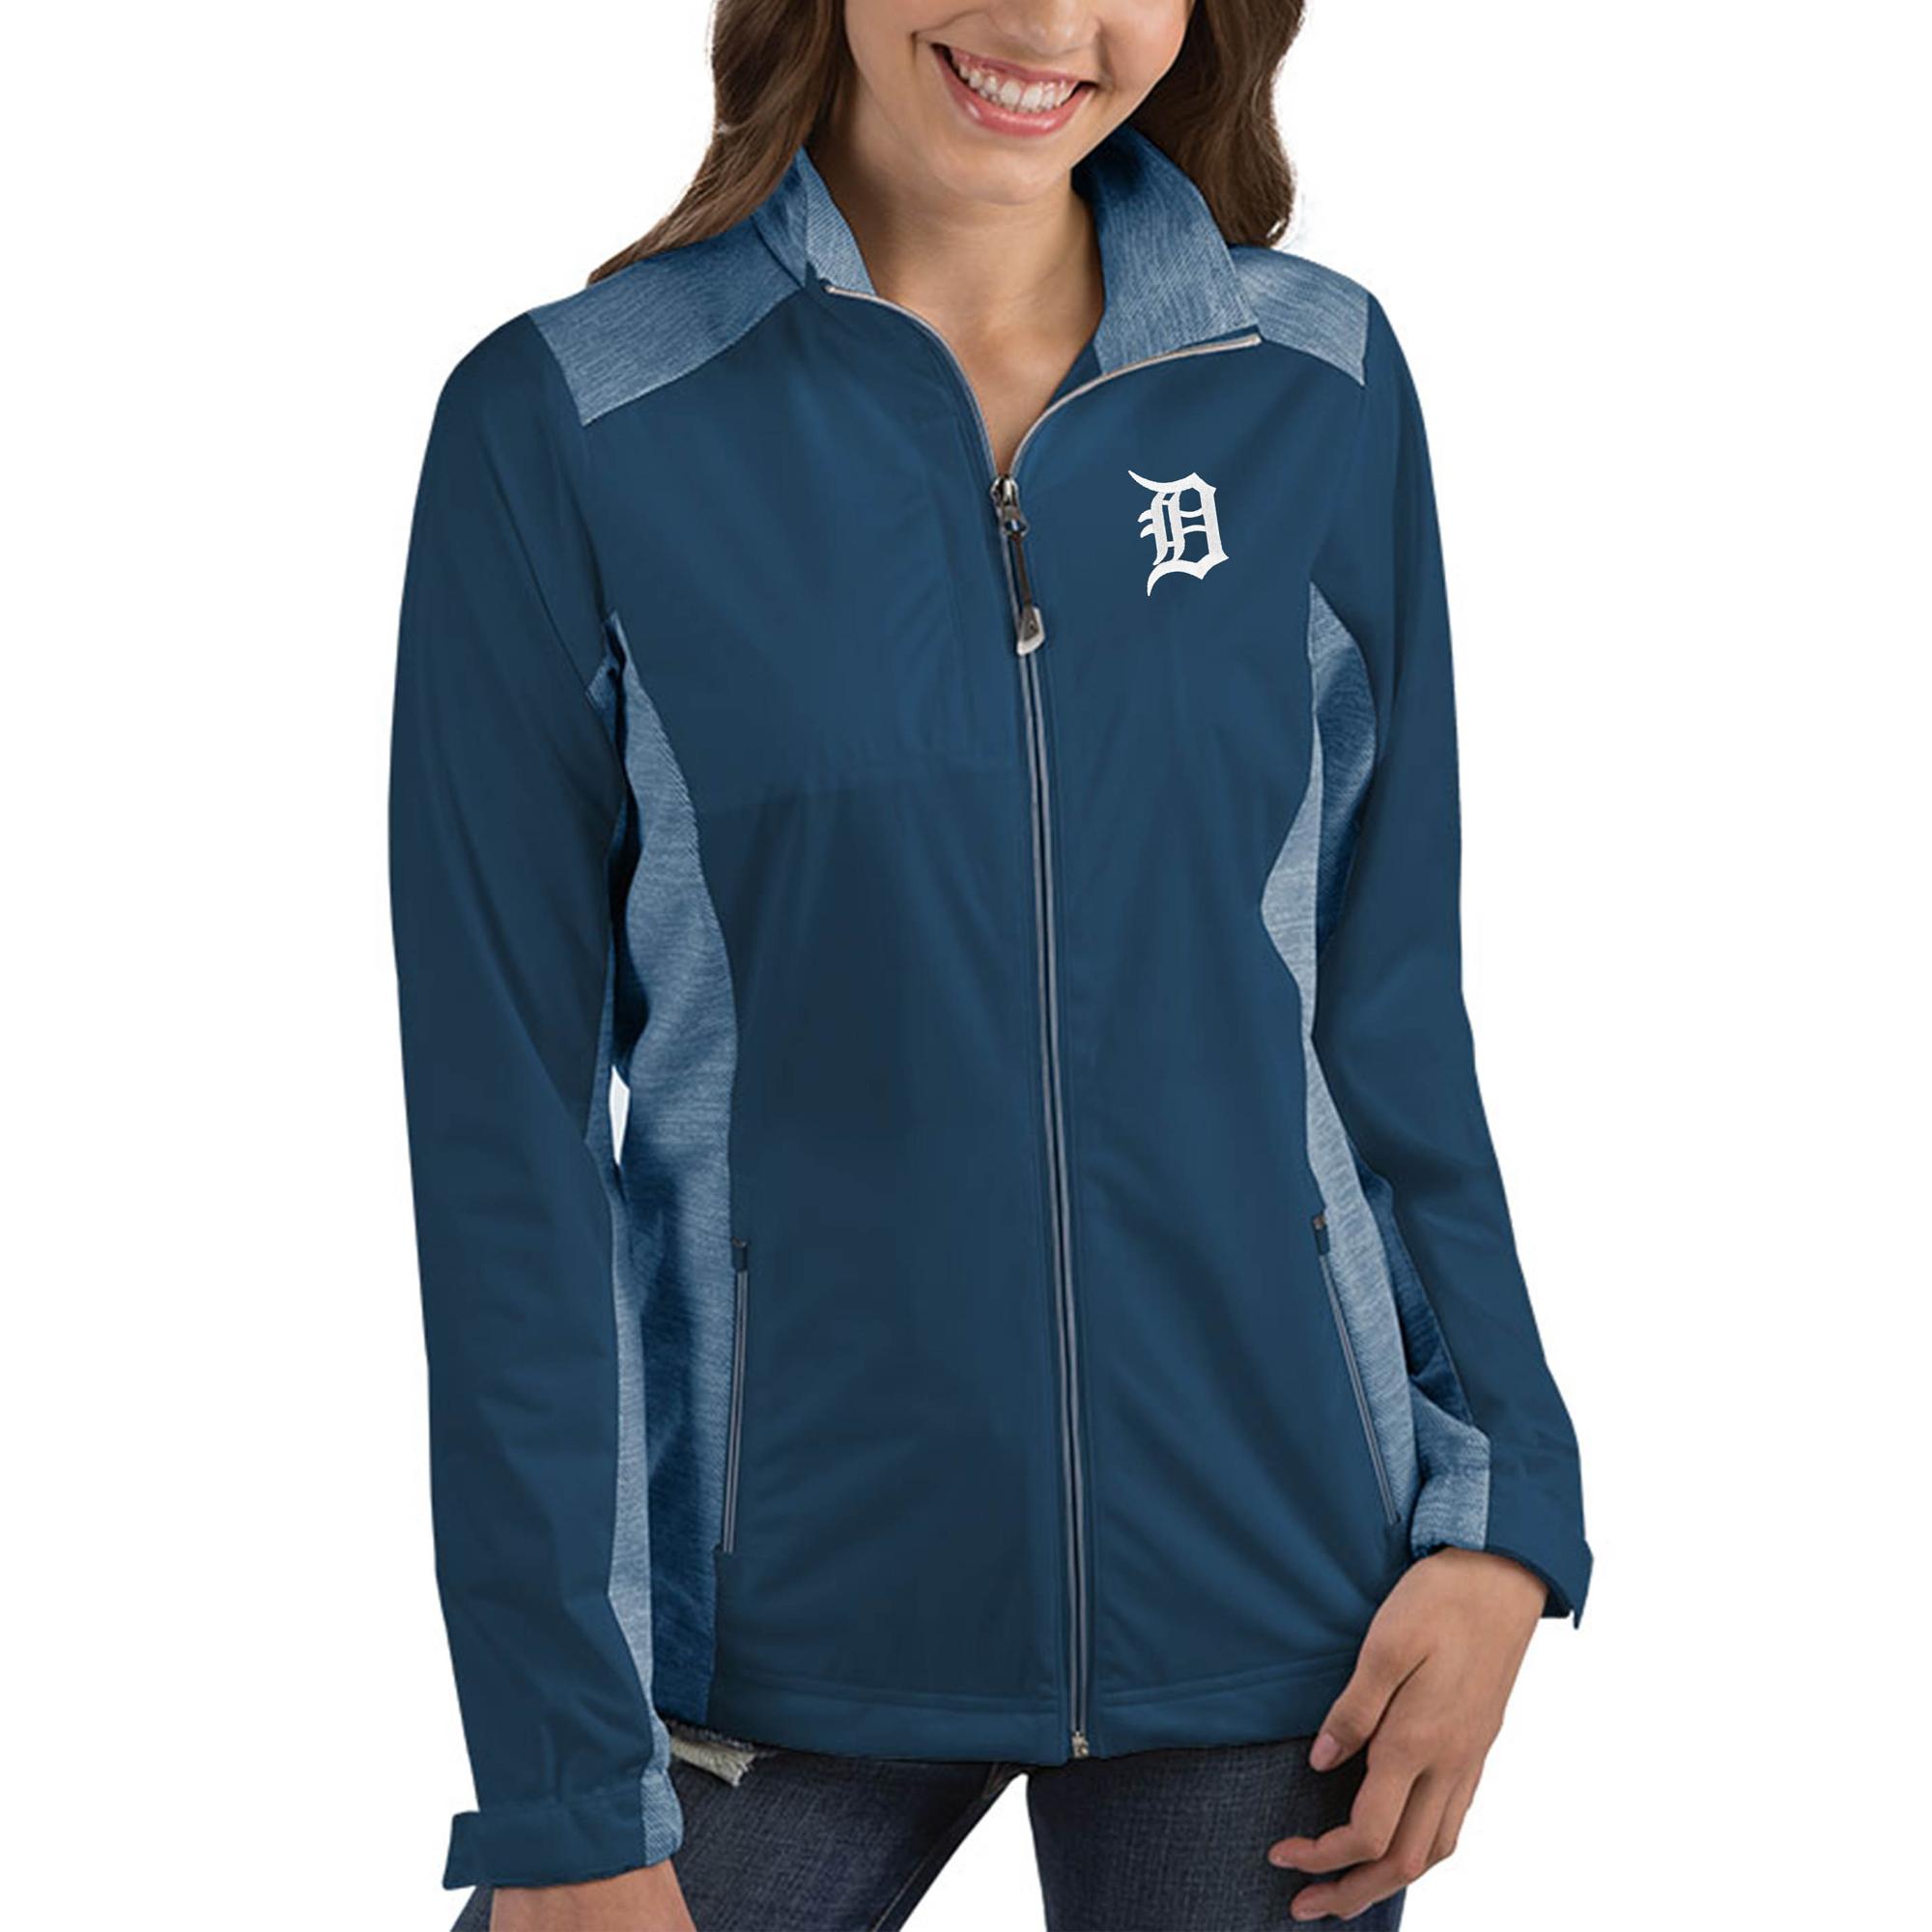 Detroit Tigers Antigua Women's Revolve Full-Zip Jacket - Navy